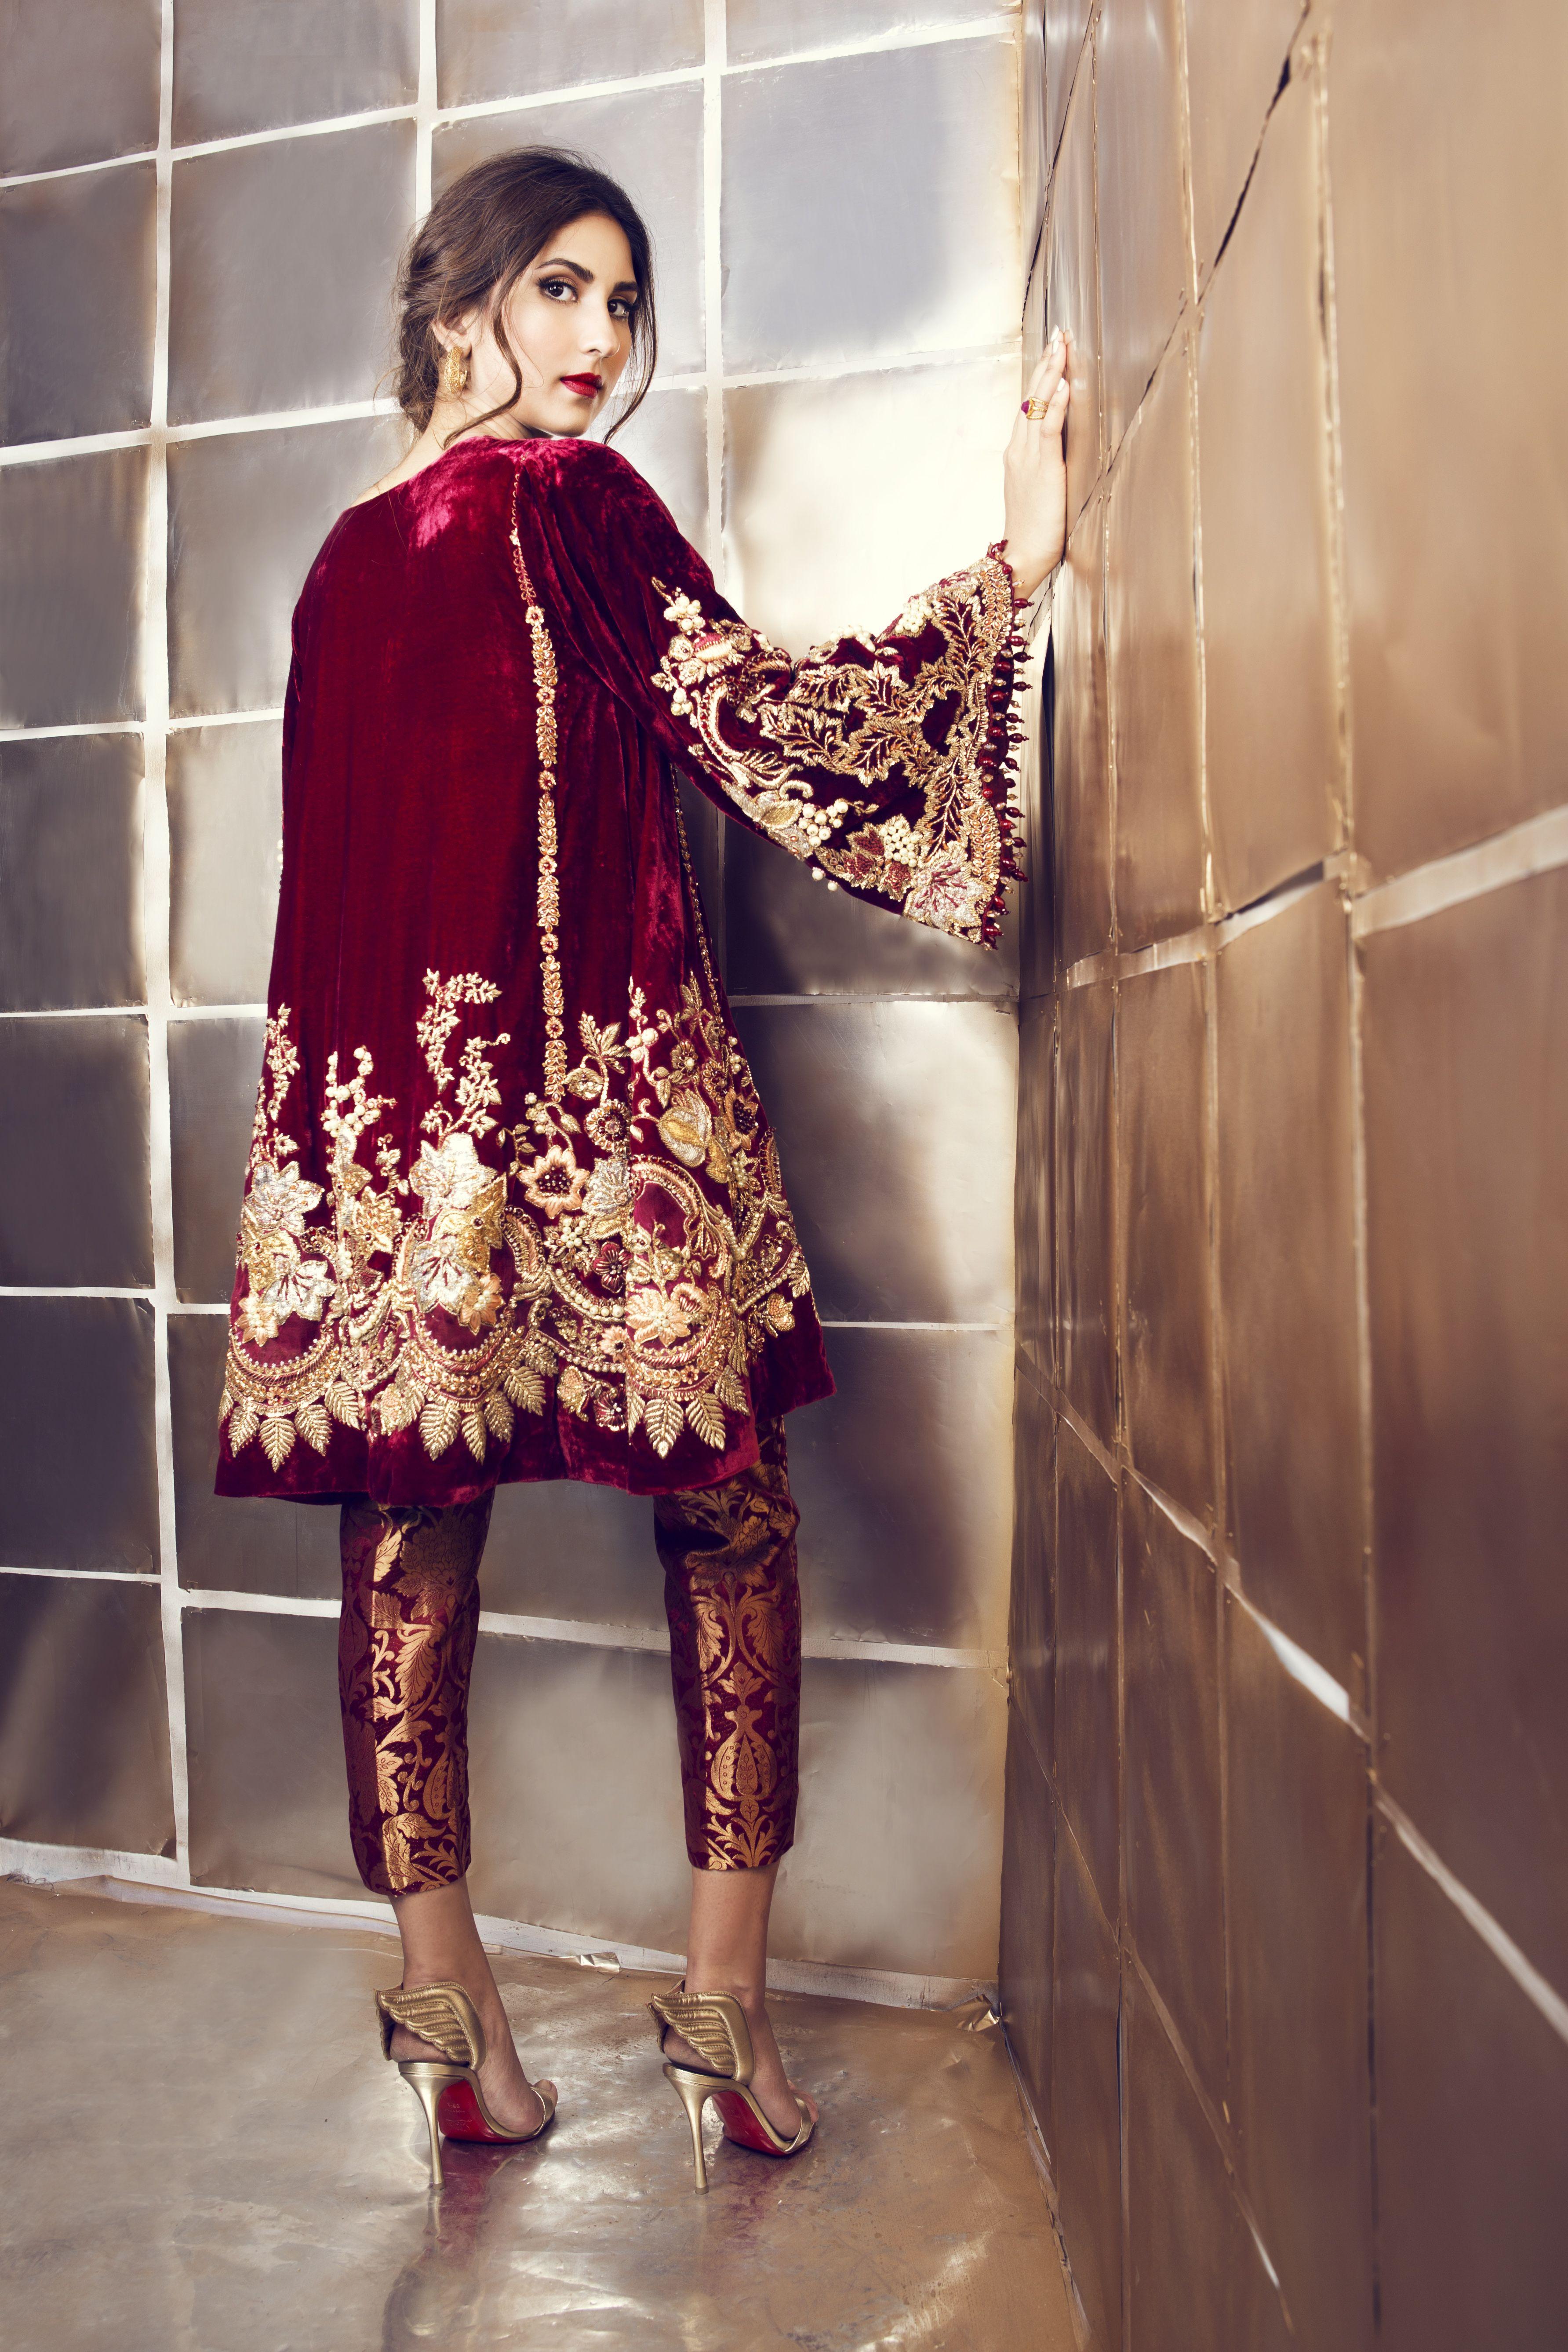 Red dress | Traditional Dresses | Pinterest | afghanische Kleider ...